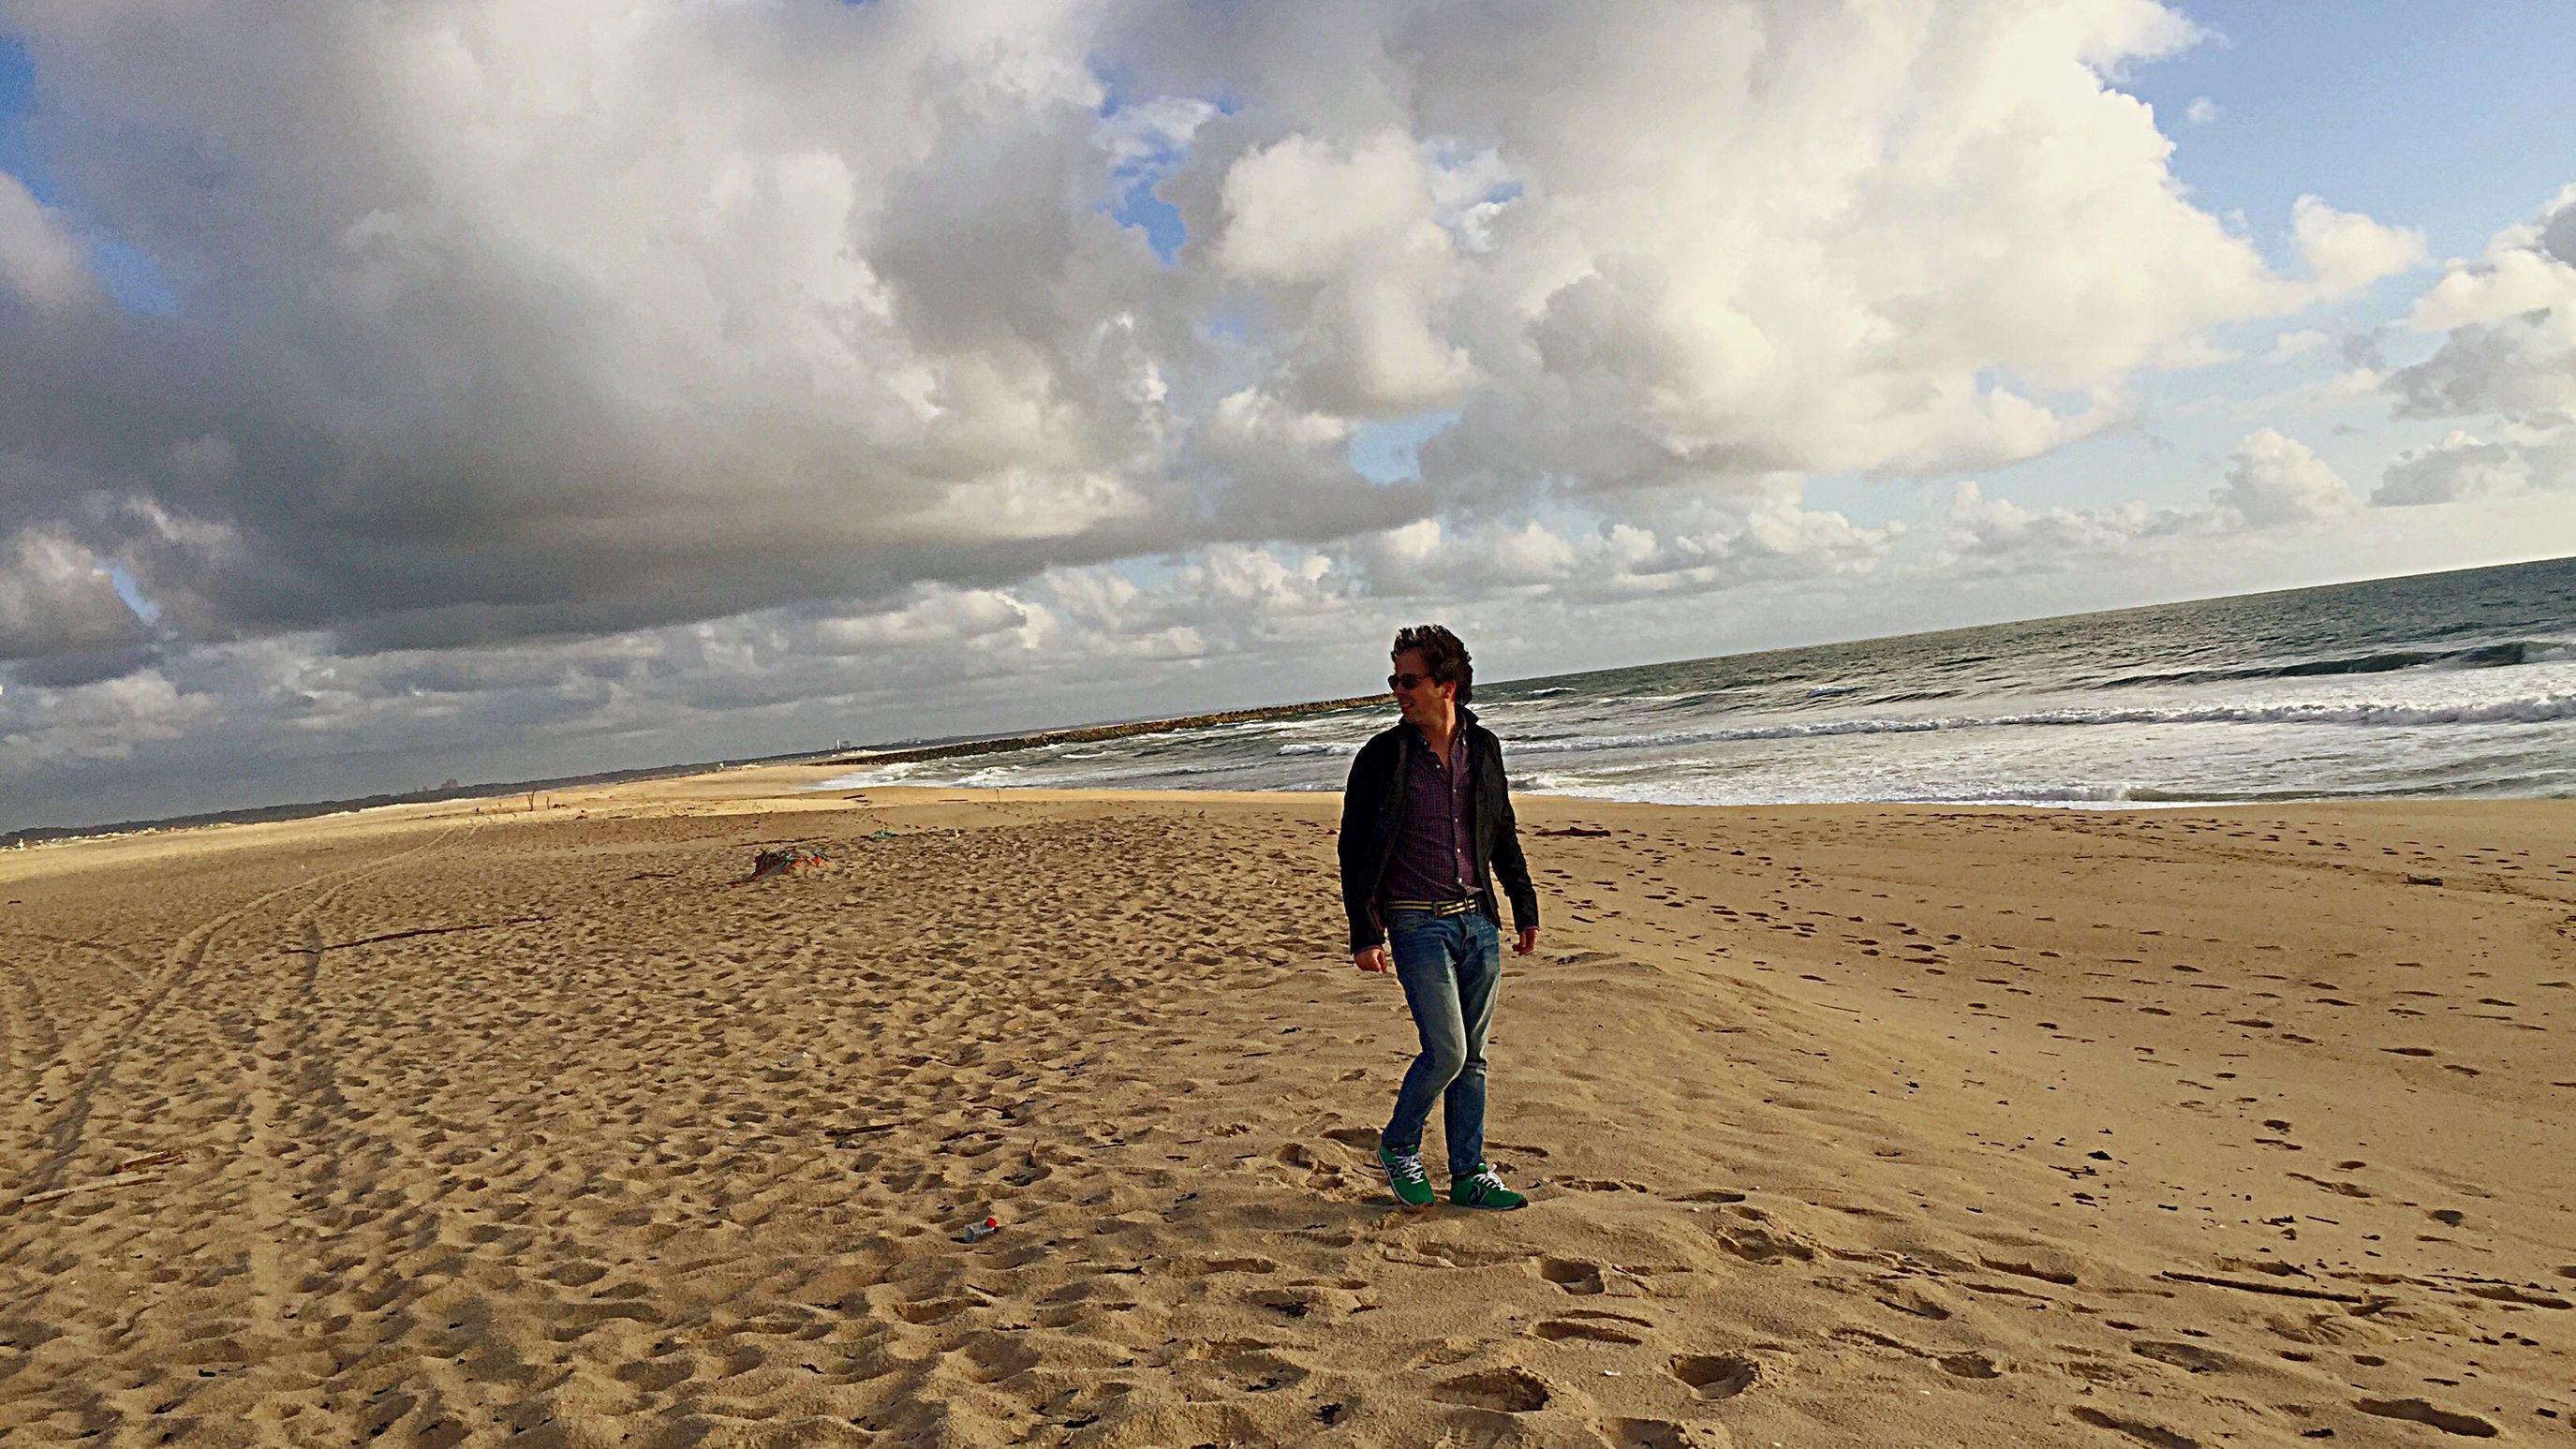 Relaxing Praia Guanilho Sunshine Me Myself & I Raspaz De Lisboa